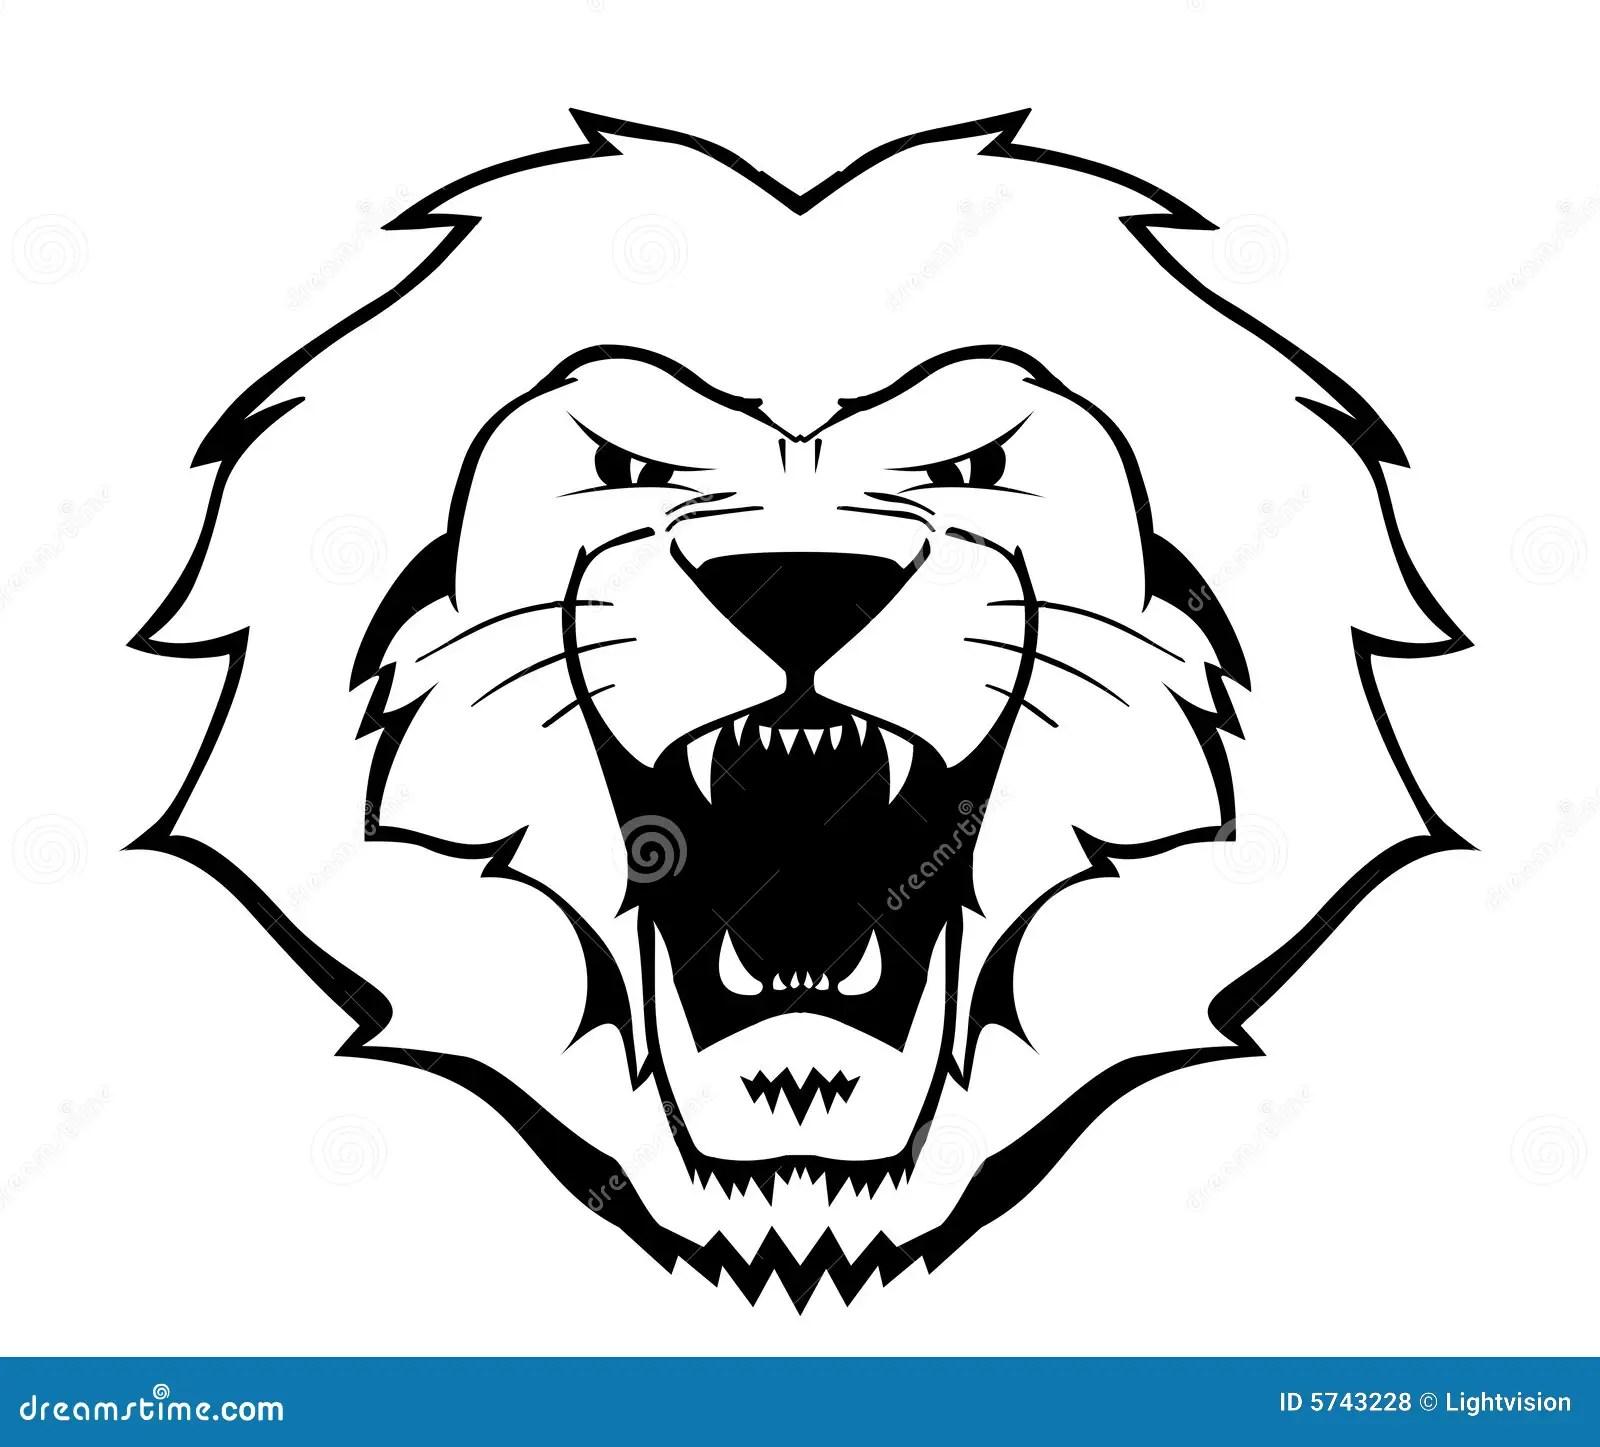 Lion Illustration Stock Vector Illustration Of Football